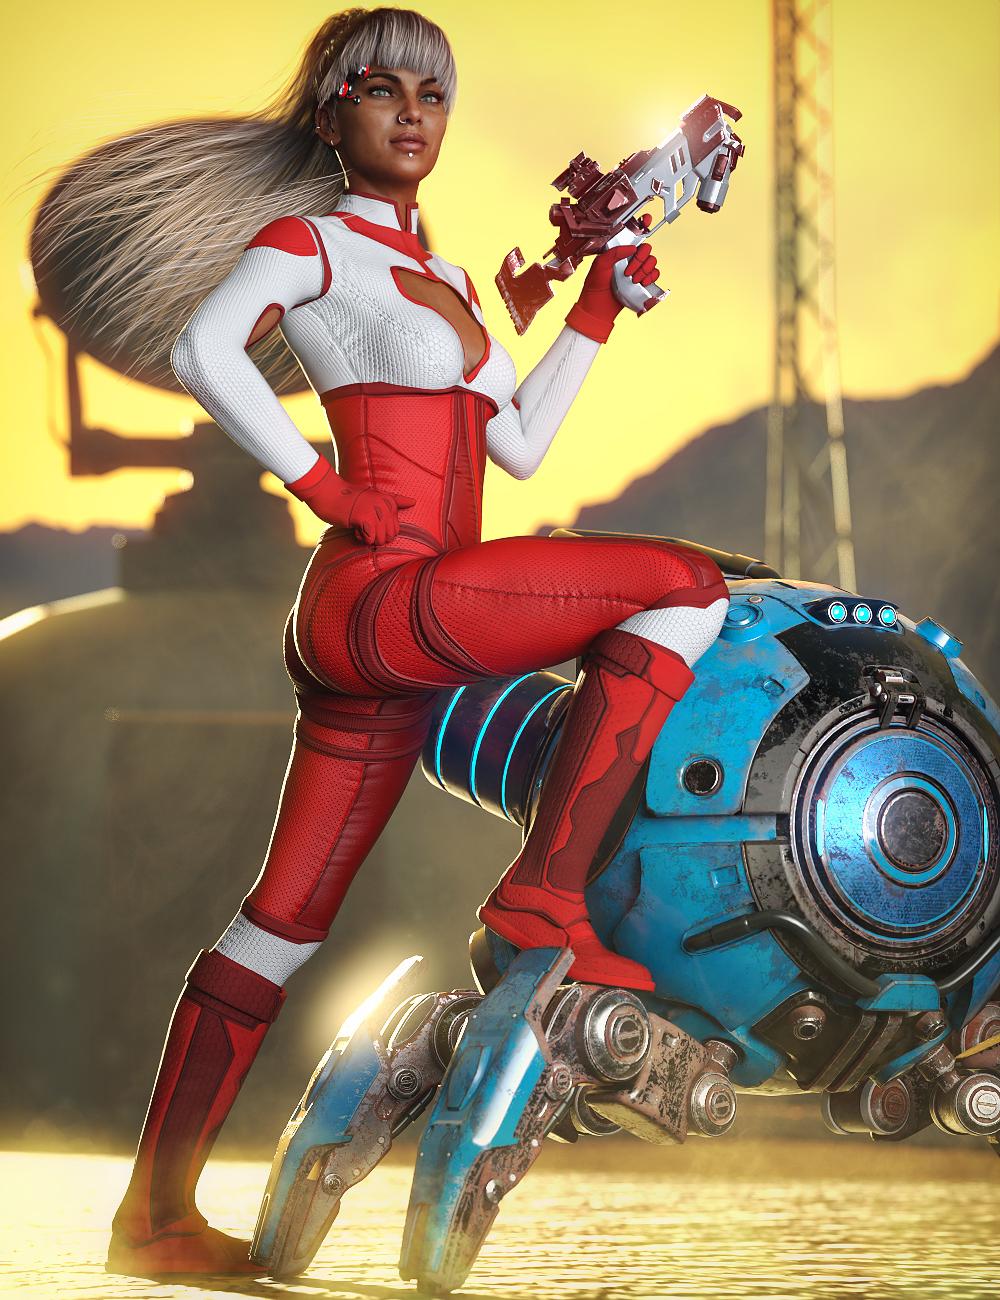 X-Fashion Sci Bodysuit 09 for Genesis 8 Females by: xtrart-3d, 3D Models by Daz 3D